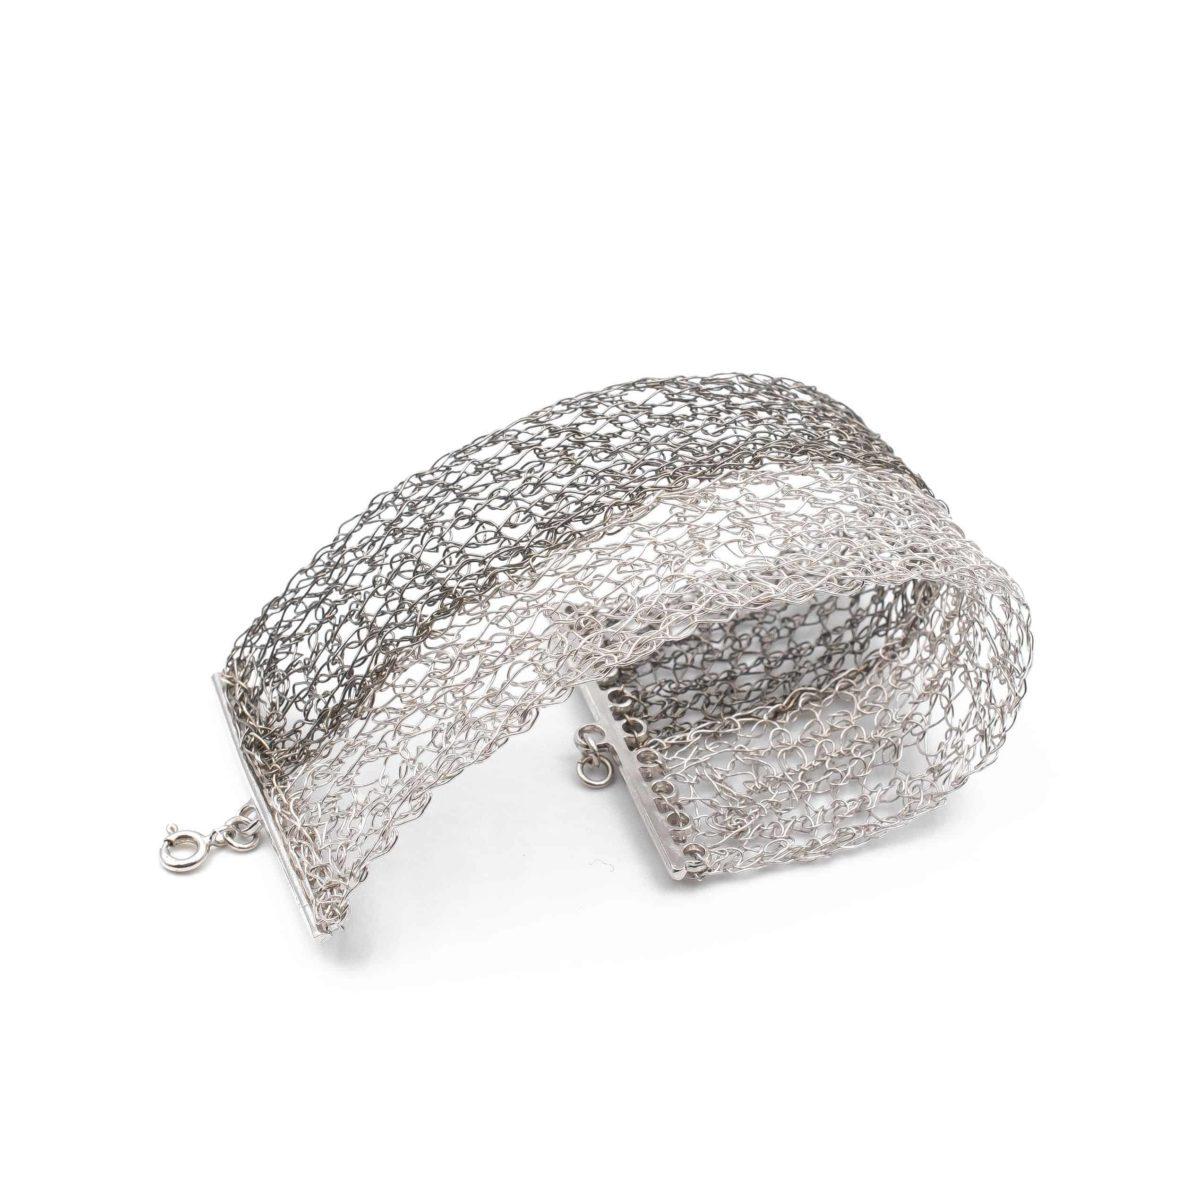 top view of platinum and black rhodium cuff bracelet for women